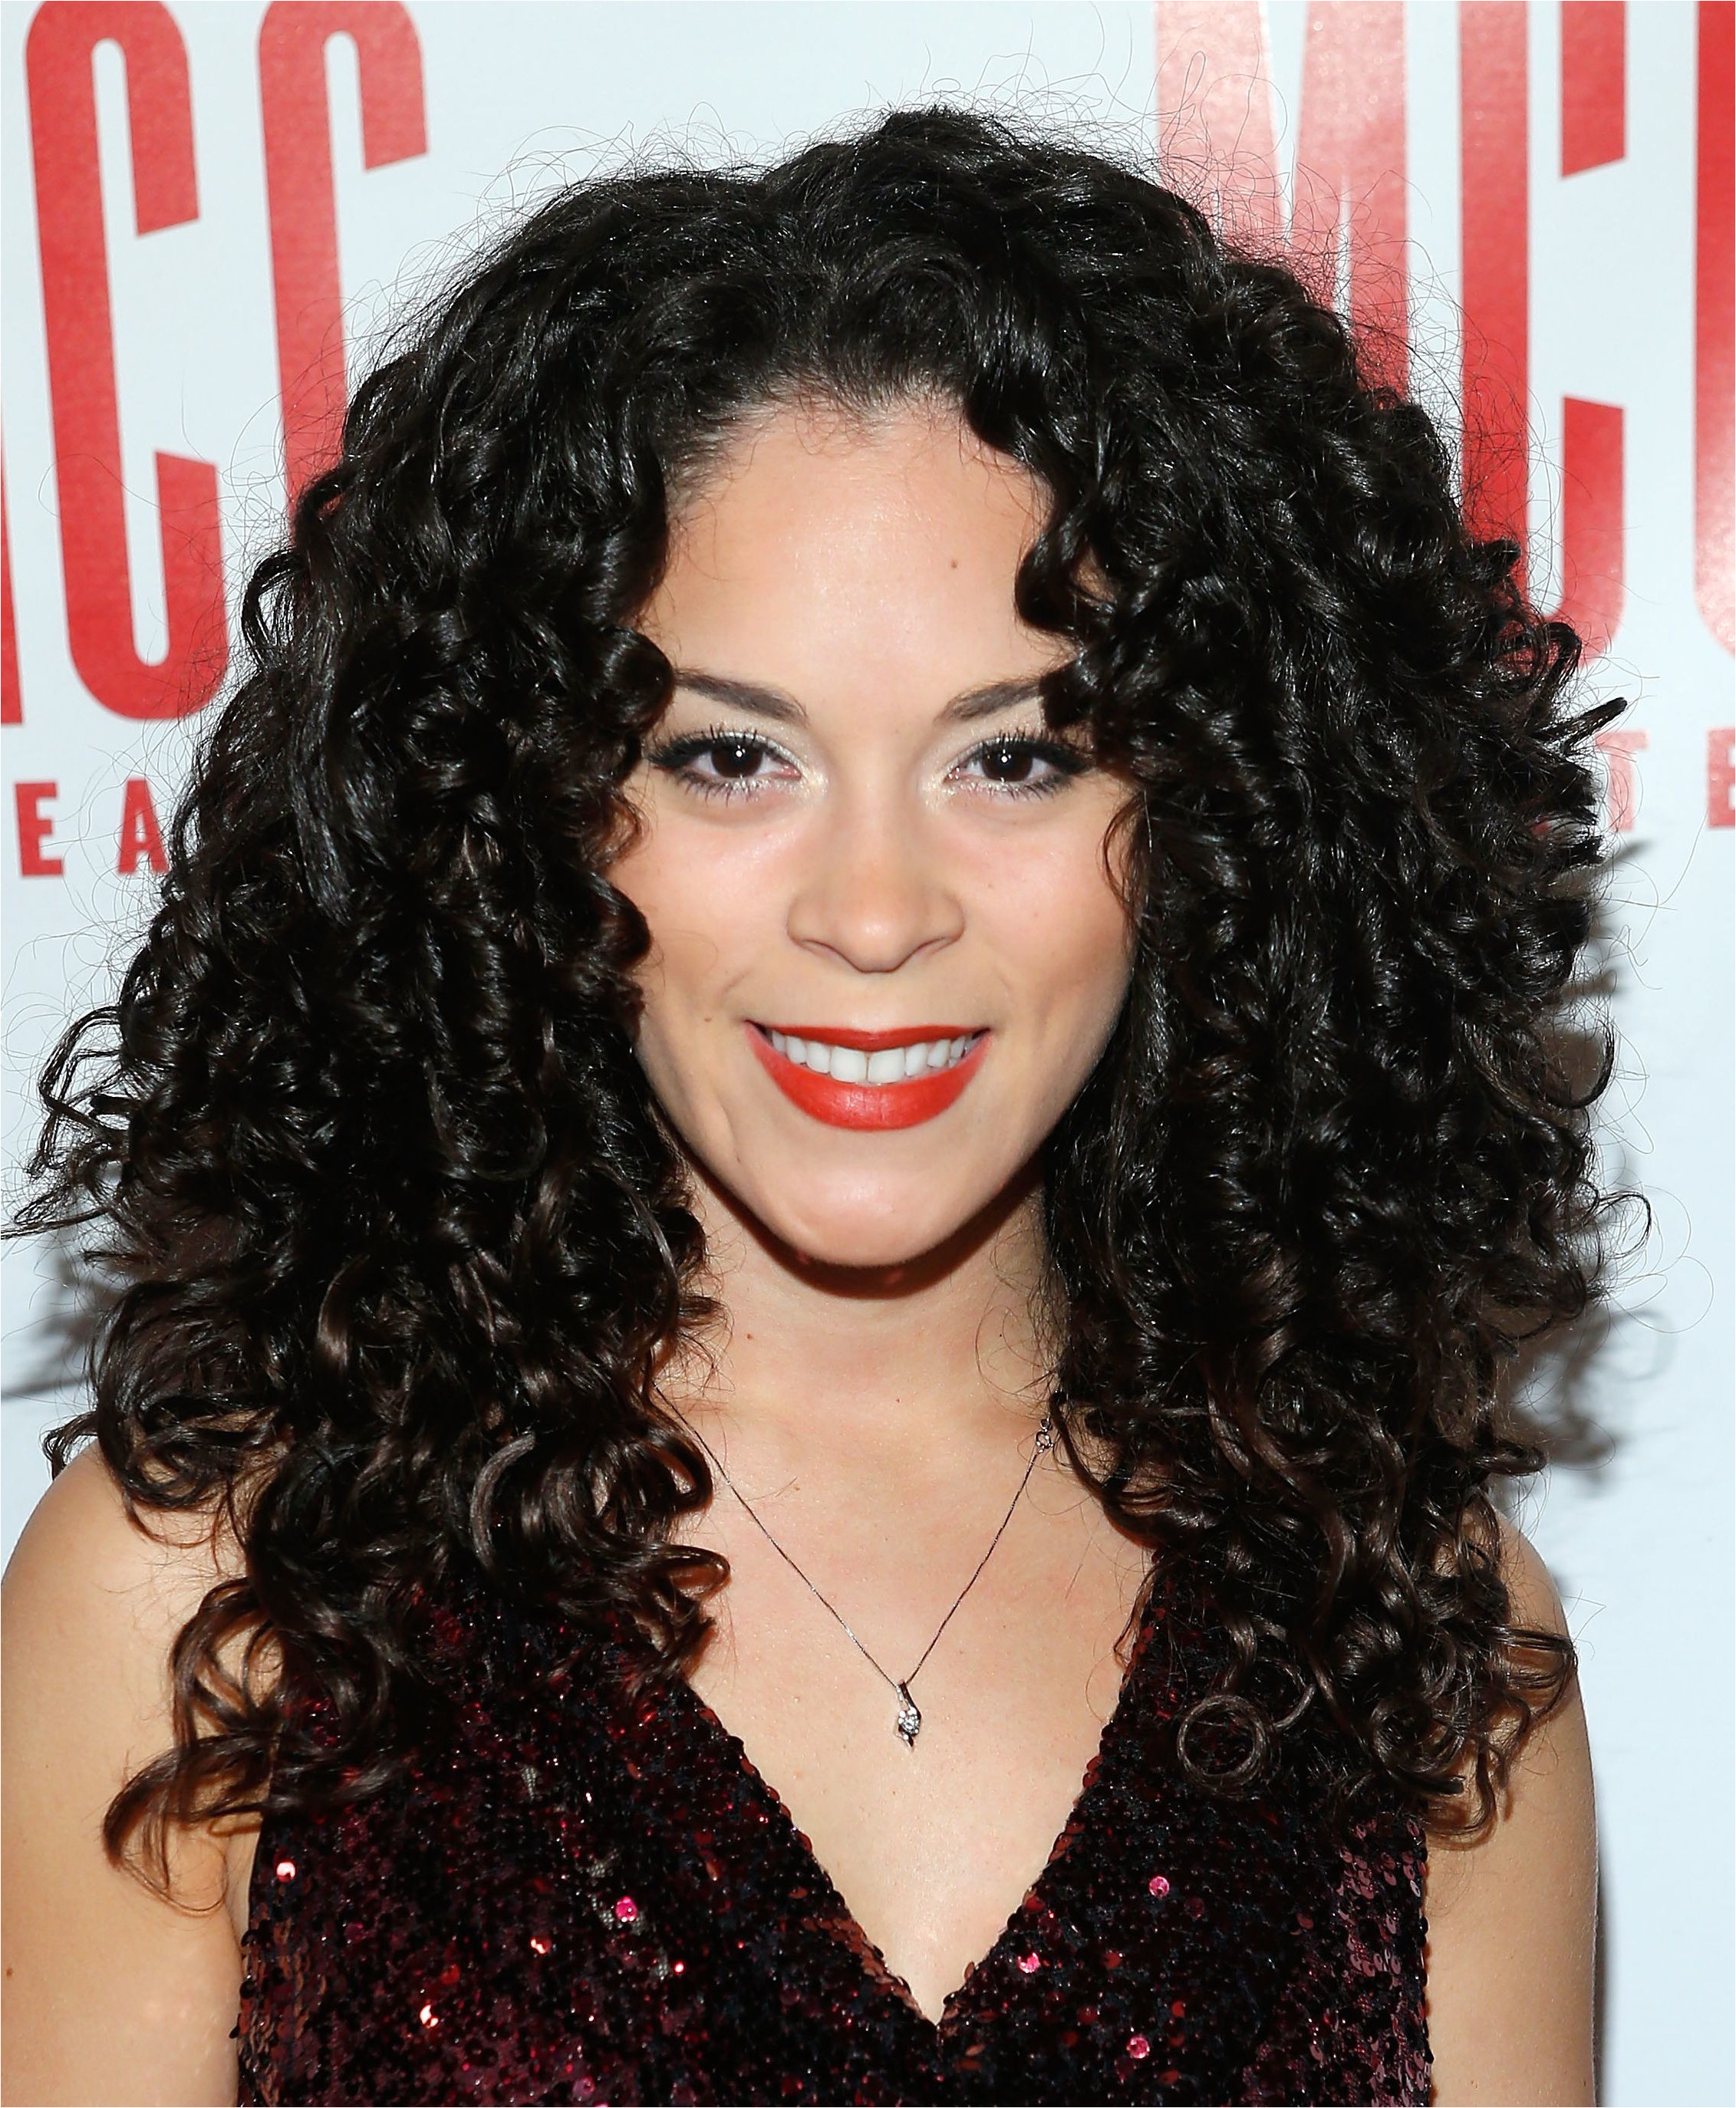 curly hair long black 56a0848f3df78cafdaa260b2